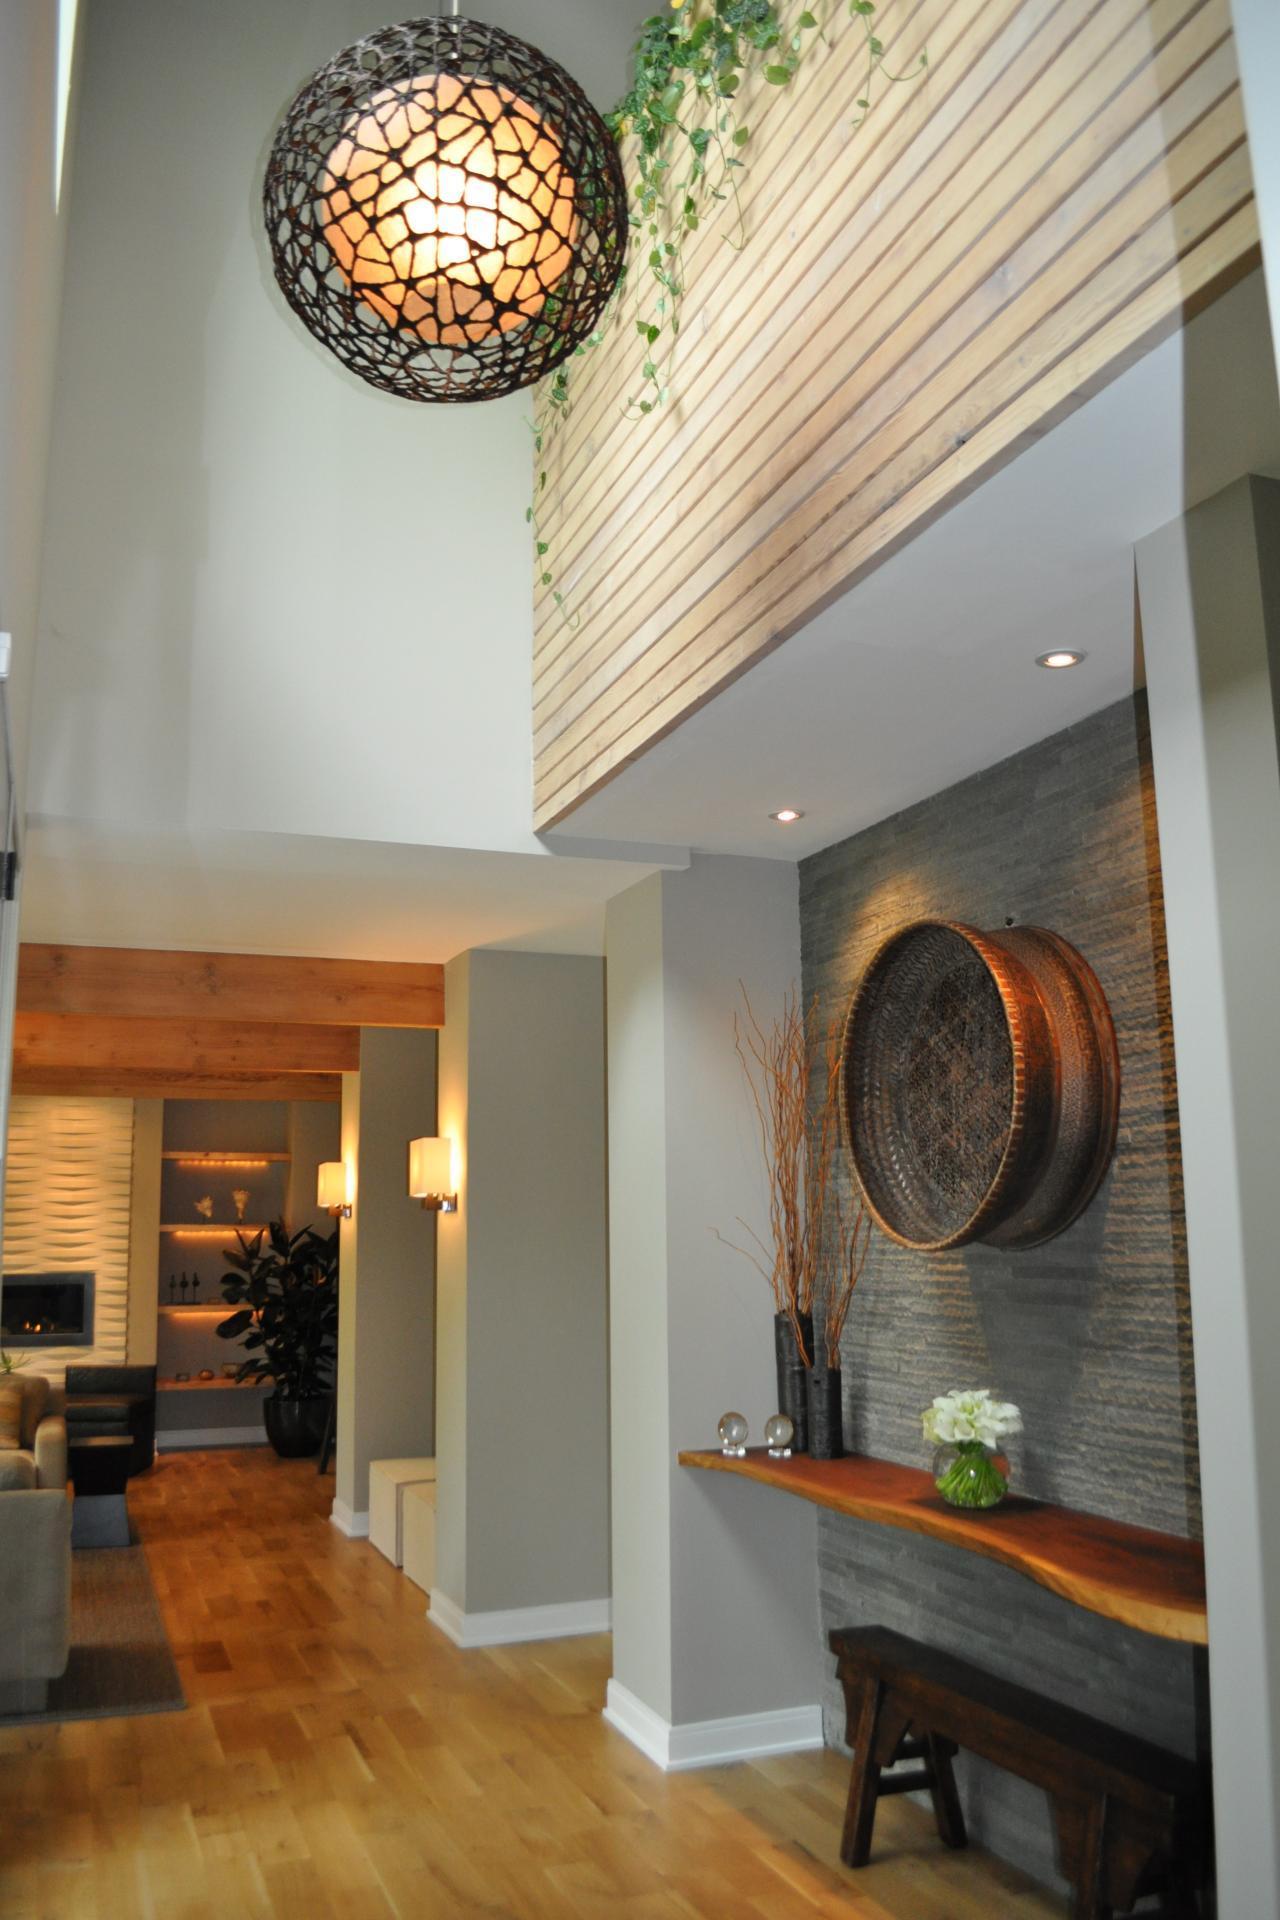 Contemporary Foyer : Modern rustic foyer with globe pendant light hgtv